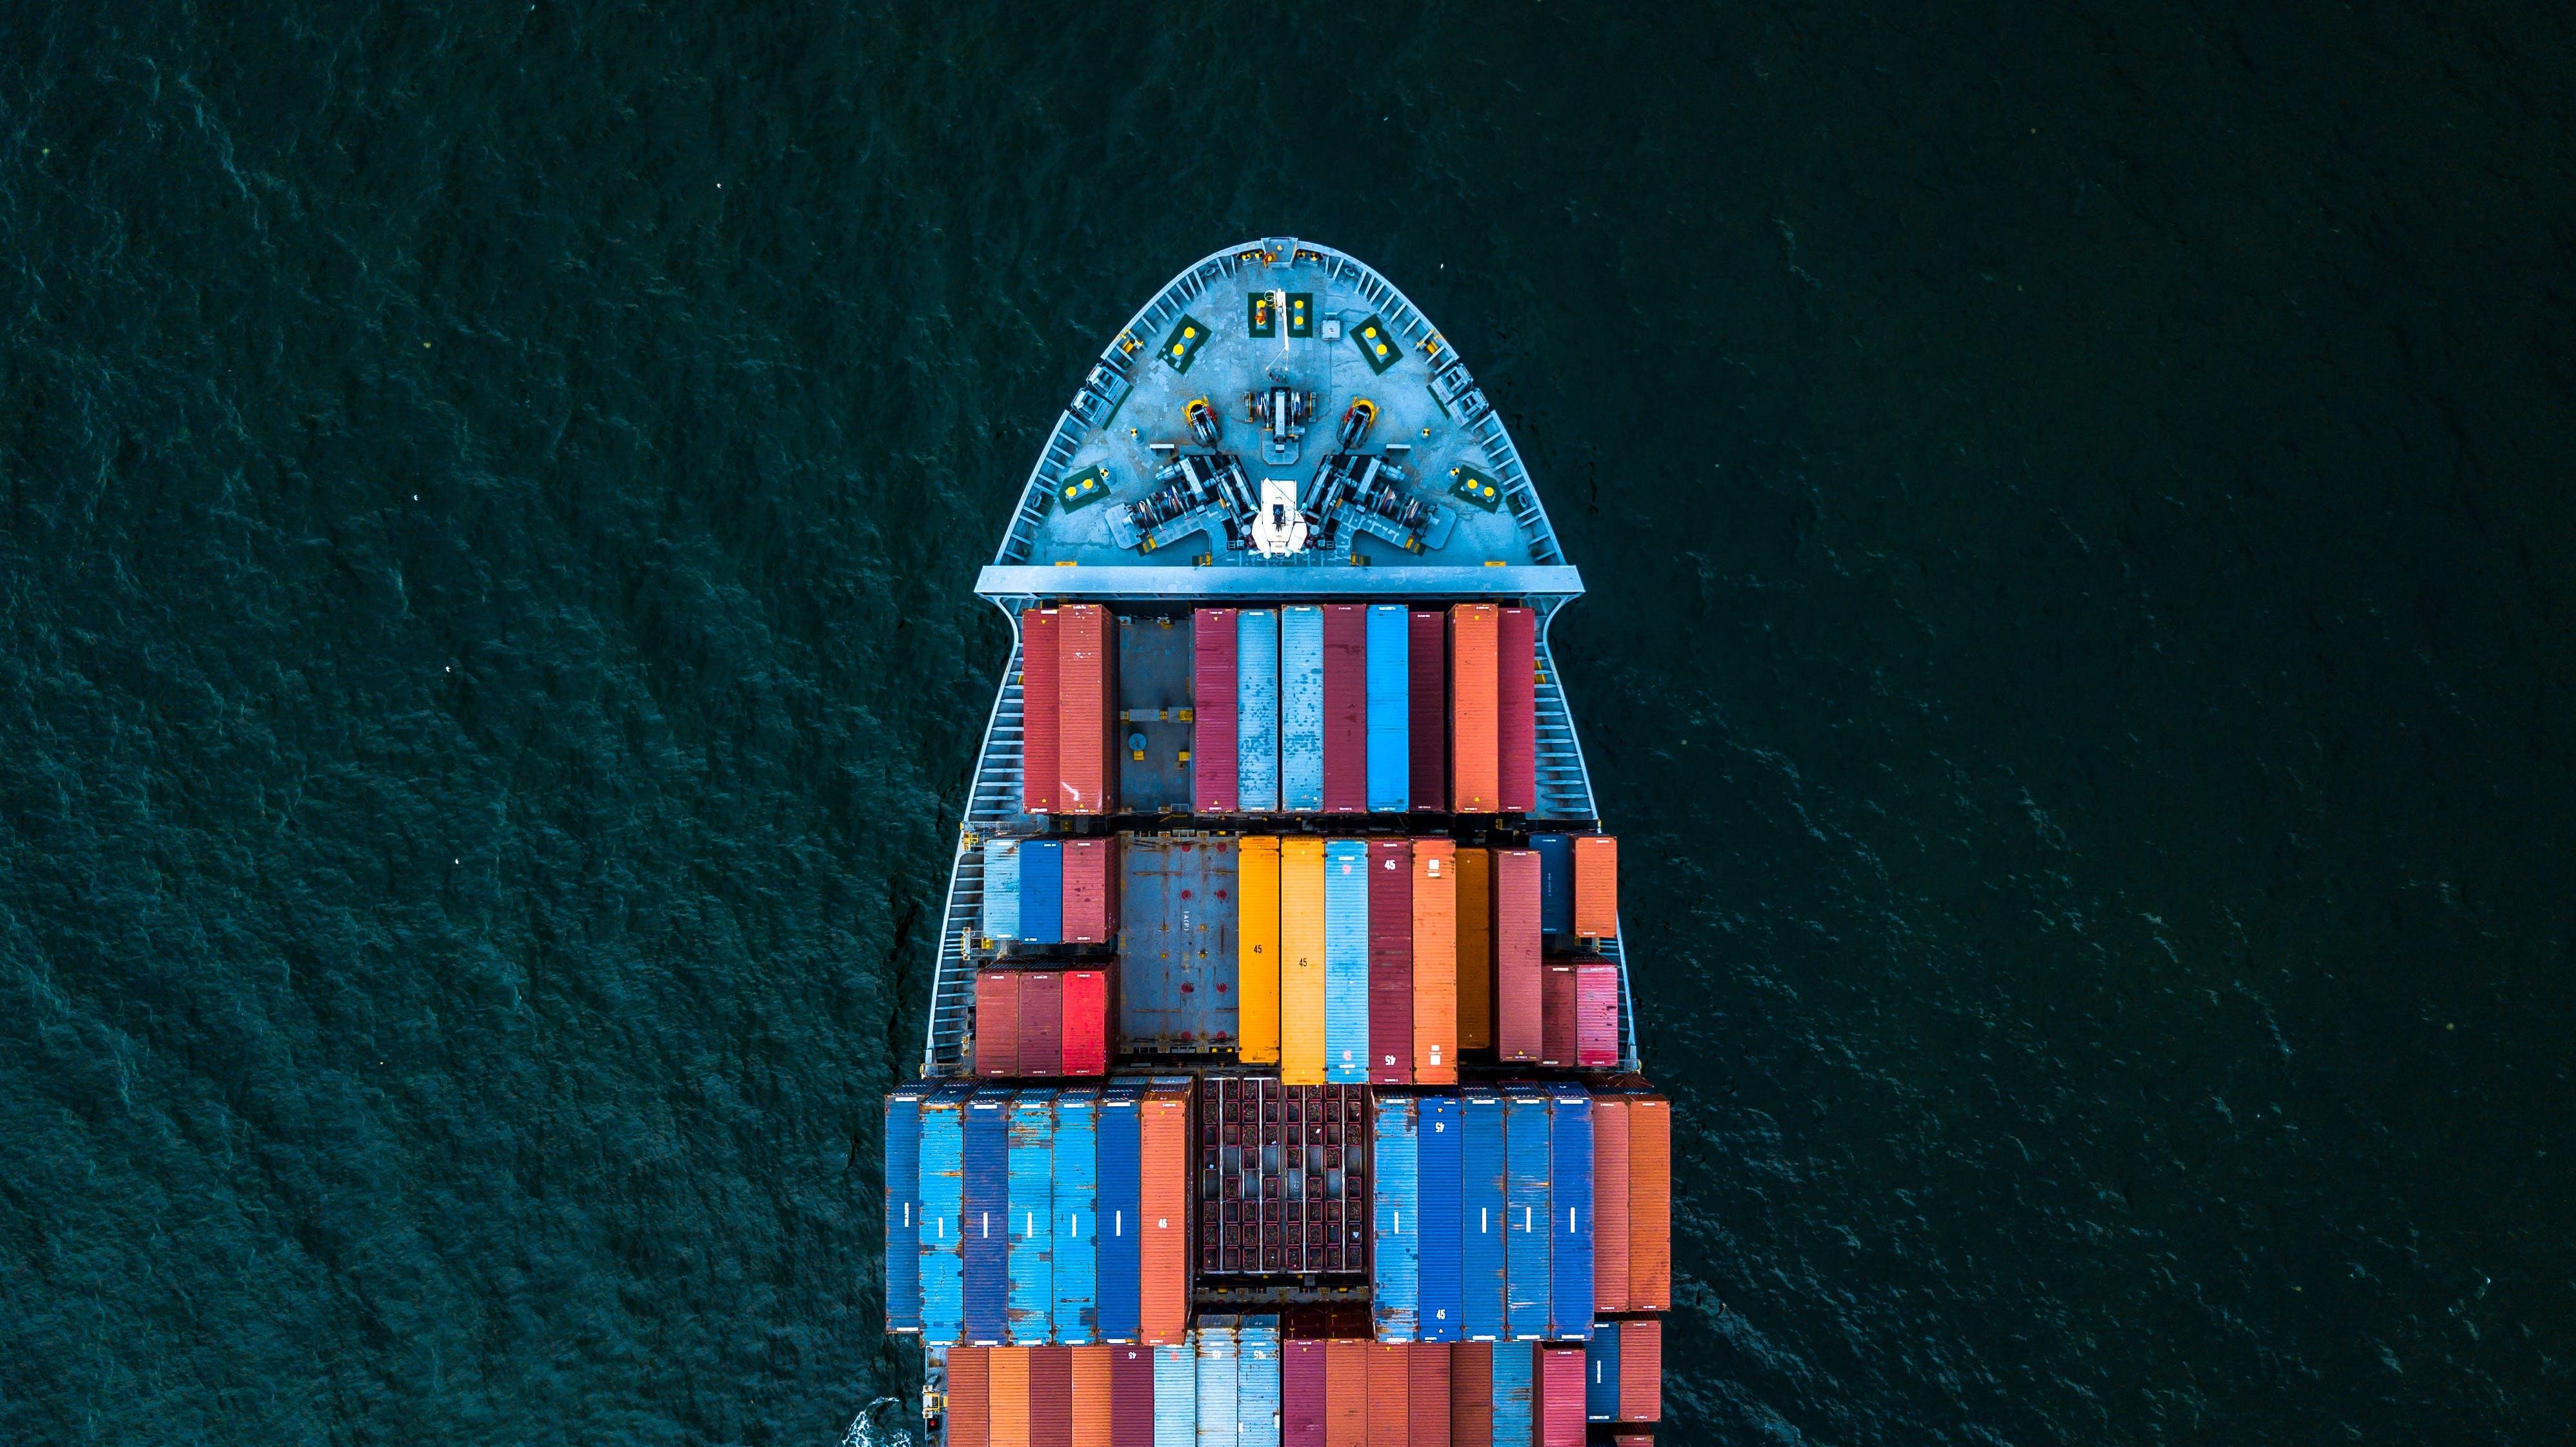 Titelbild-Zoll-Blockchain-Container-Containerschiff-Hafen-840803724-istock-AvigatorPhotographer